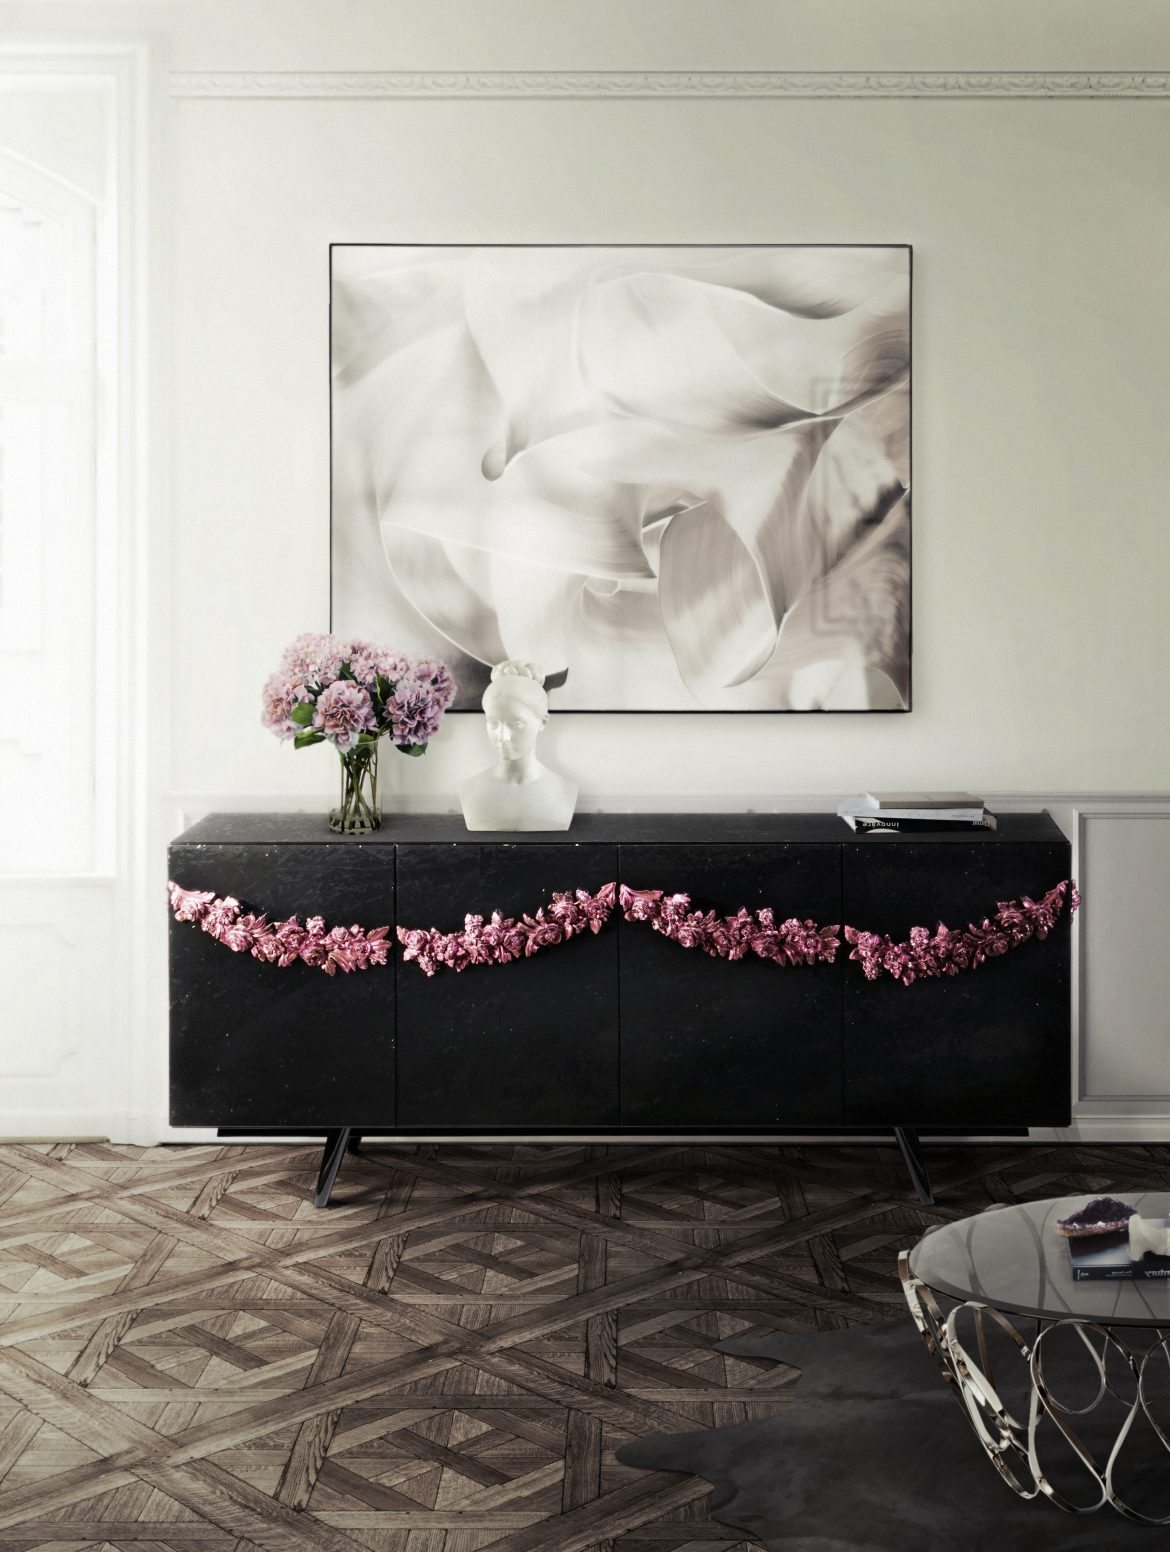 sideboard ideas Sideboard Ideas You Must Use For a Stunning Home Decor Sideboard Ideas You Must Use For a Stunning Home Decor 17